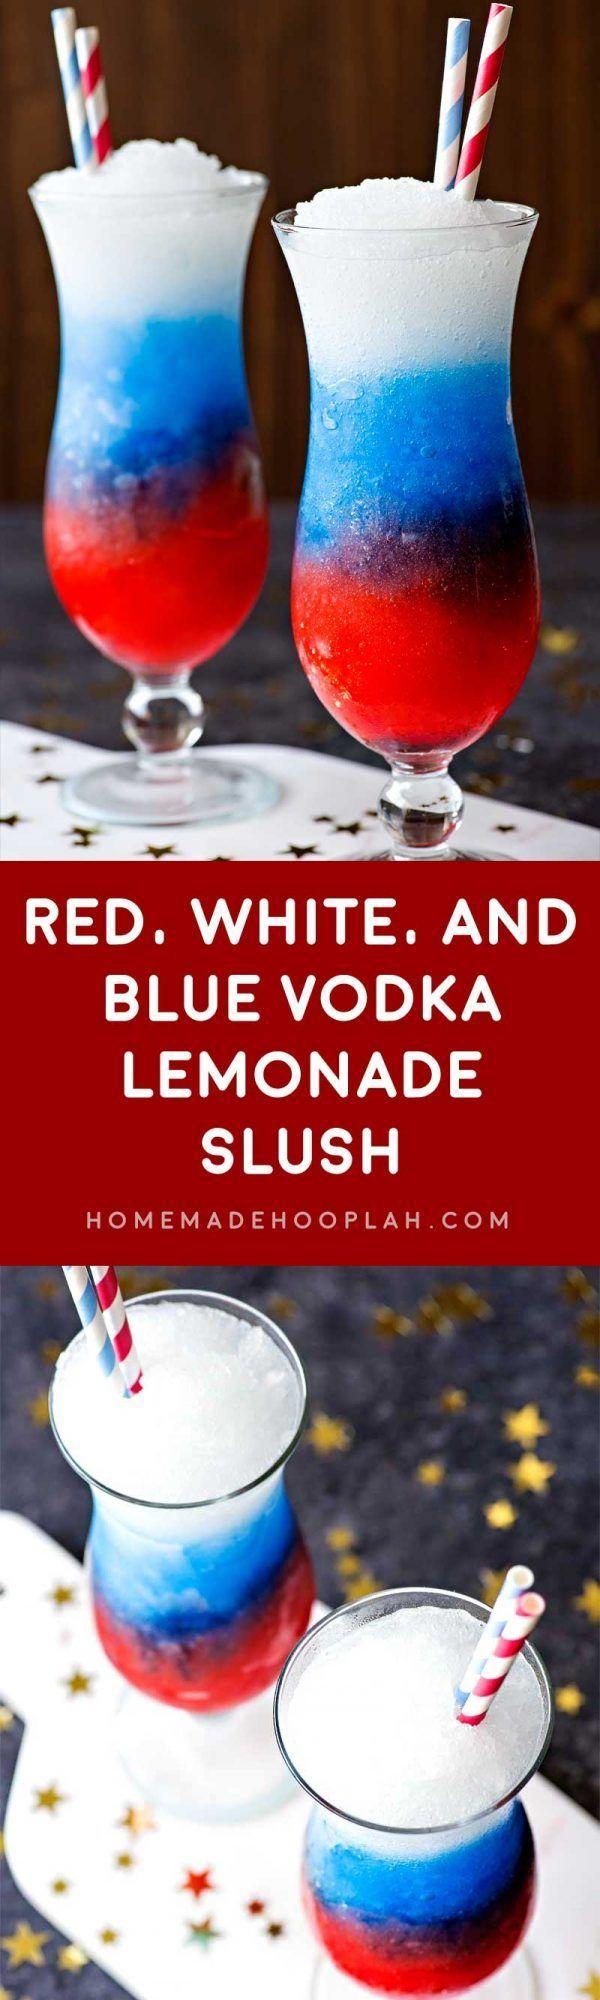 Red White and Blue Vodka Lemonade Slush! Celebrate your patriotism with a refreshing slush made with grenadine, blue curacao, and spiked lem...